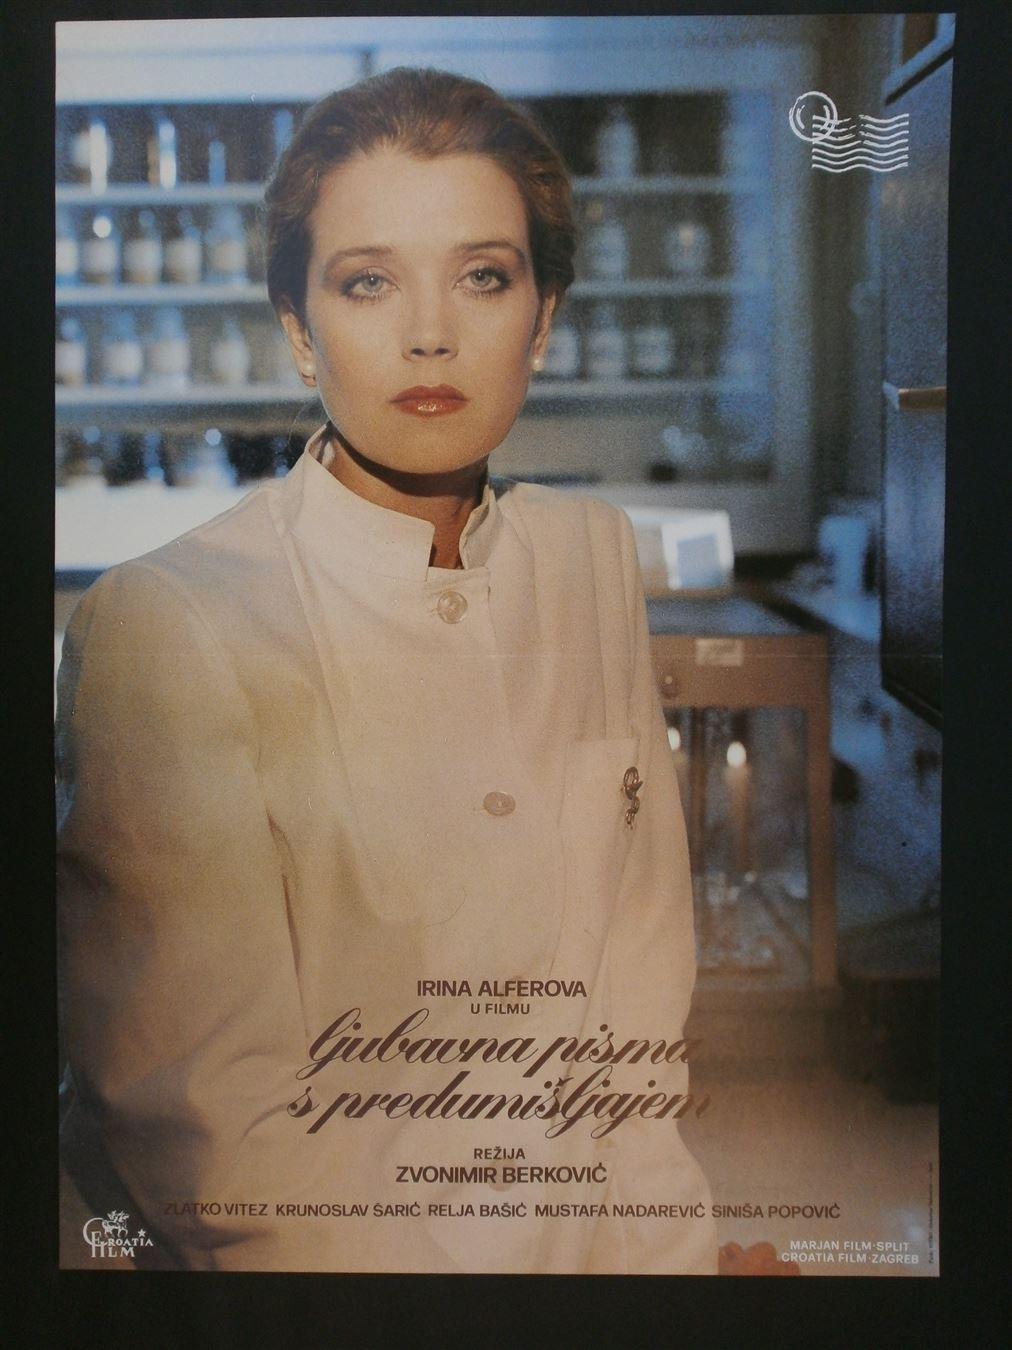 LJUBAVNA-PISMA-SA-PREDUMISLJAJEM-1985-Re